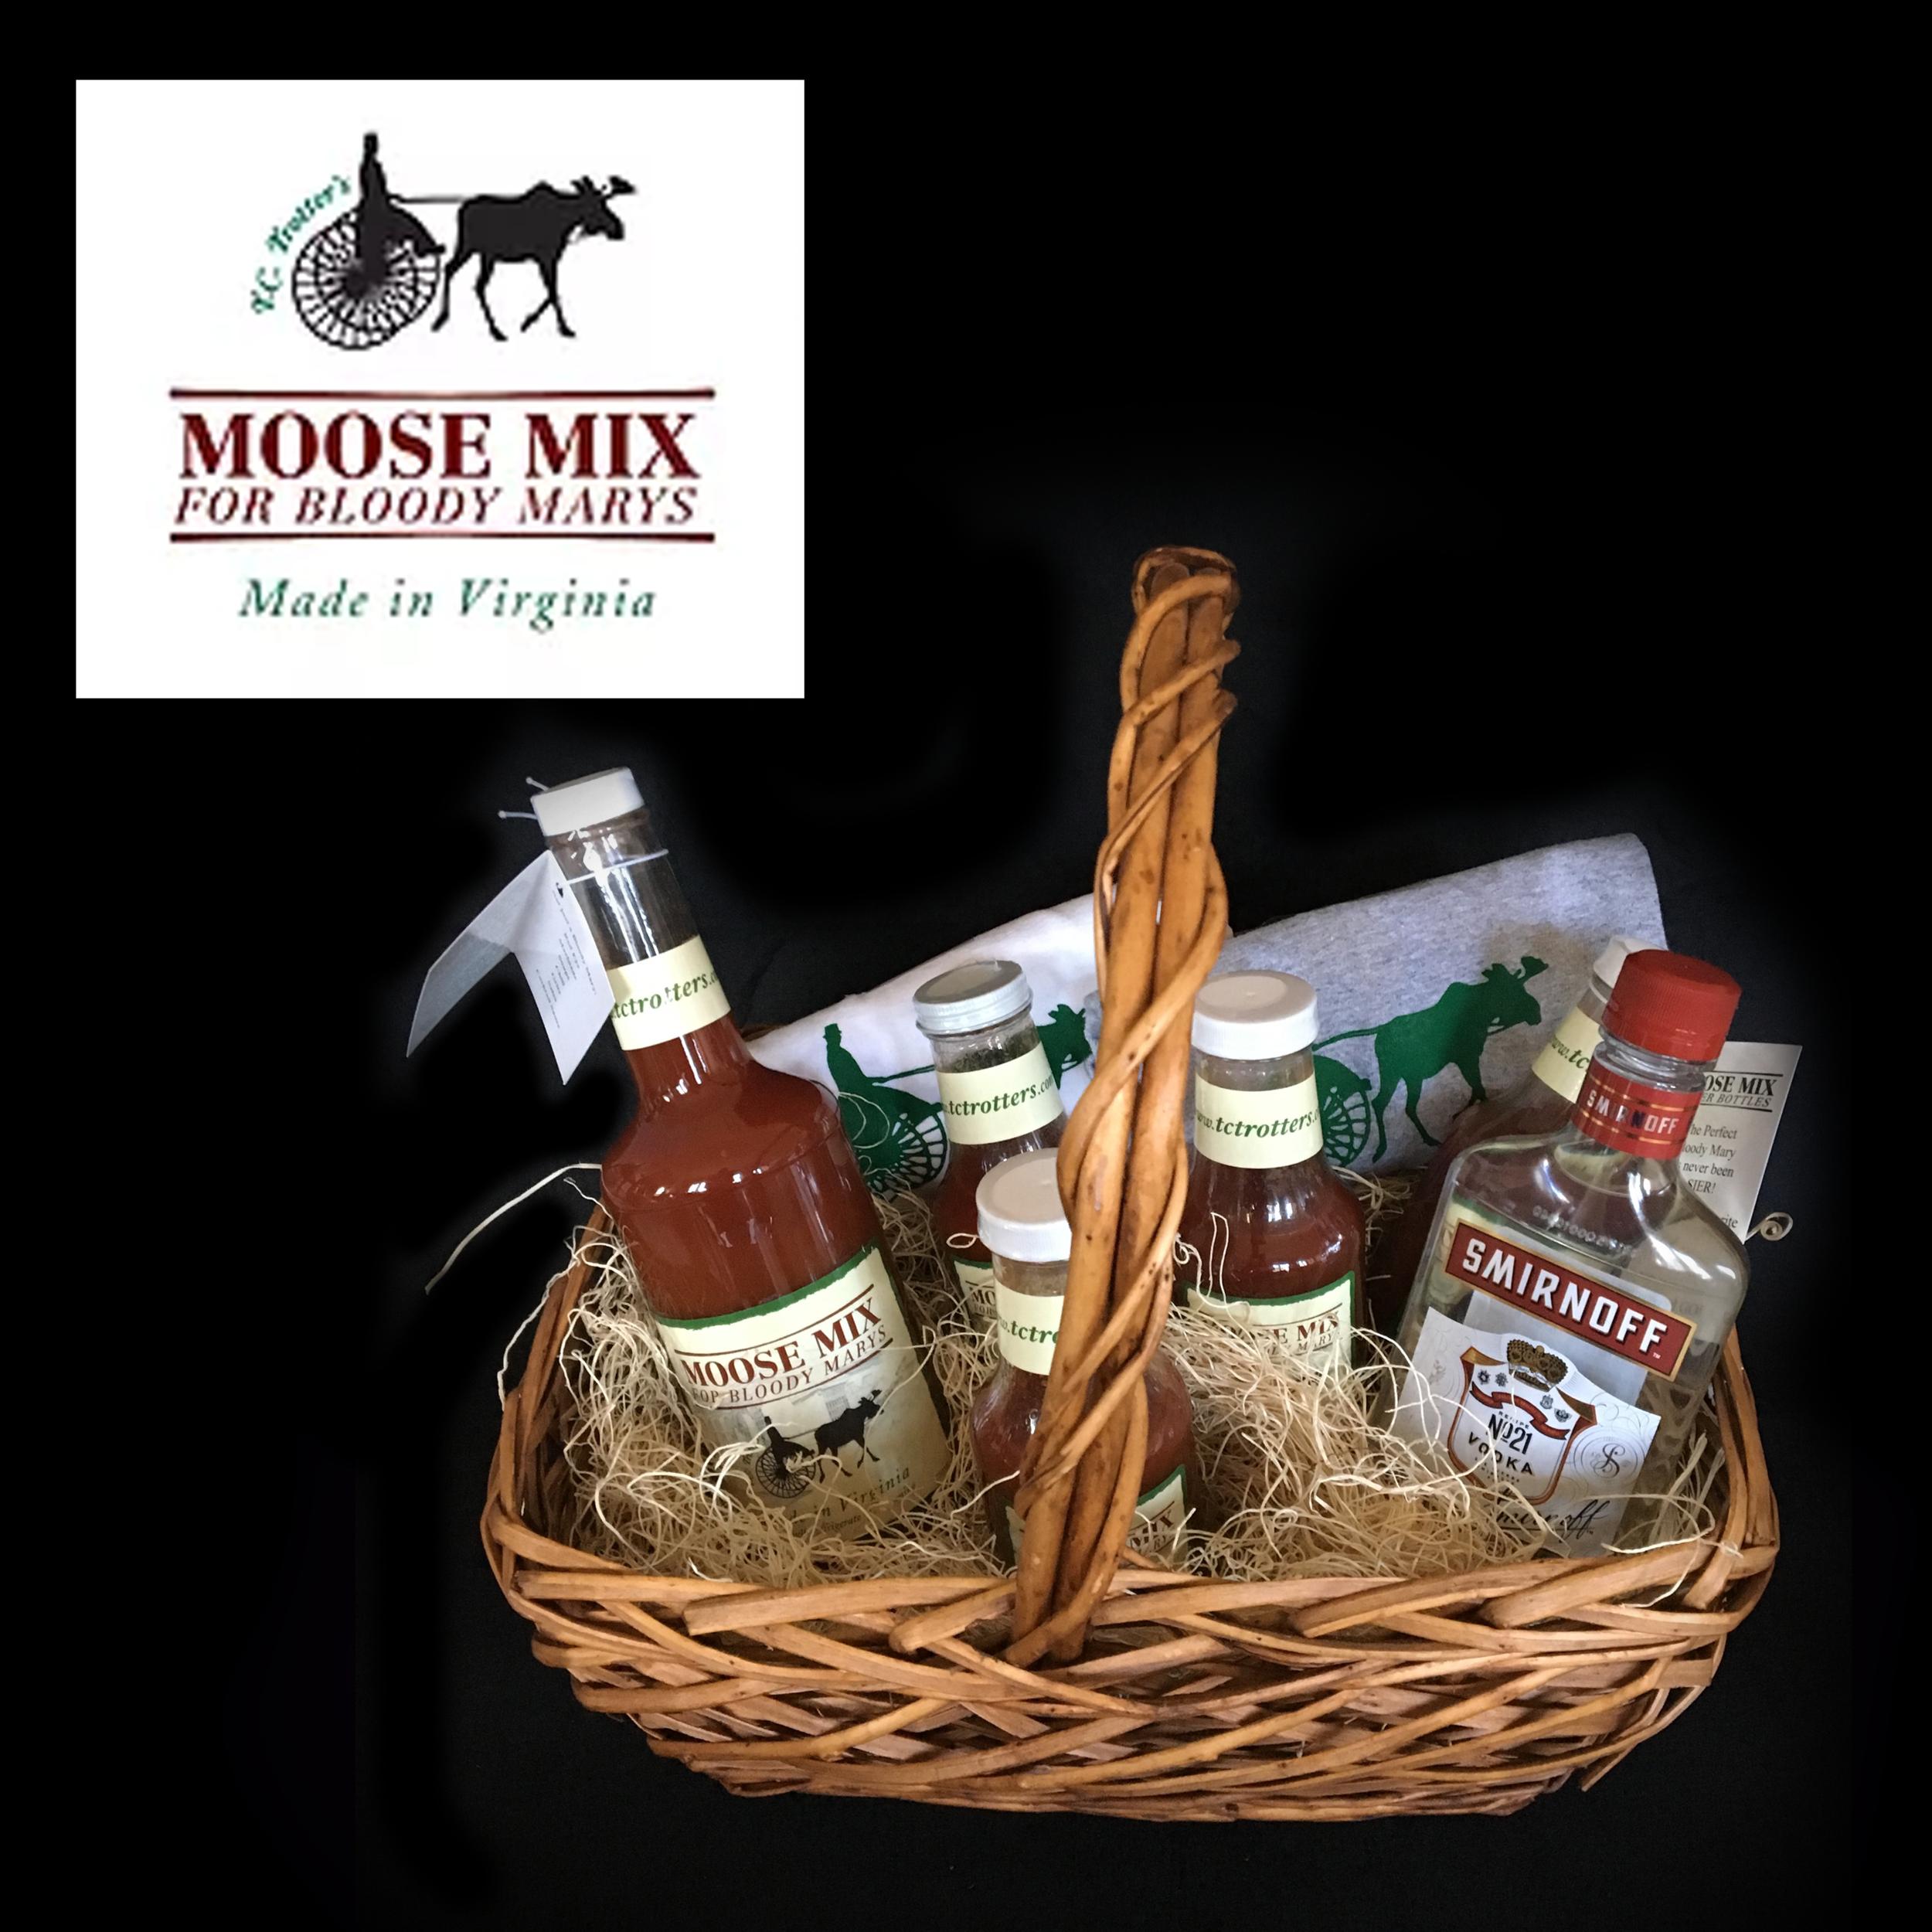 "Moose Mix Basket - Large Moose Mix, 4 individual serving bottles, 1 bottle of Smirnoff vodka""His and Hers"" TC Trotters t-shirts"